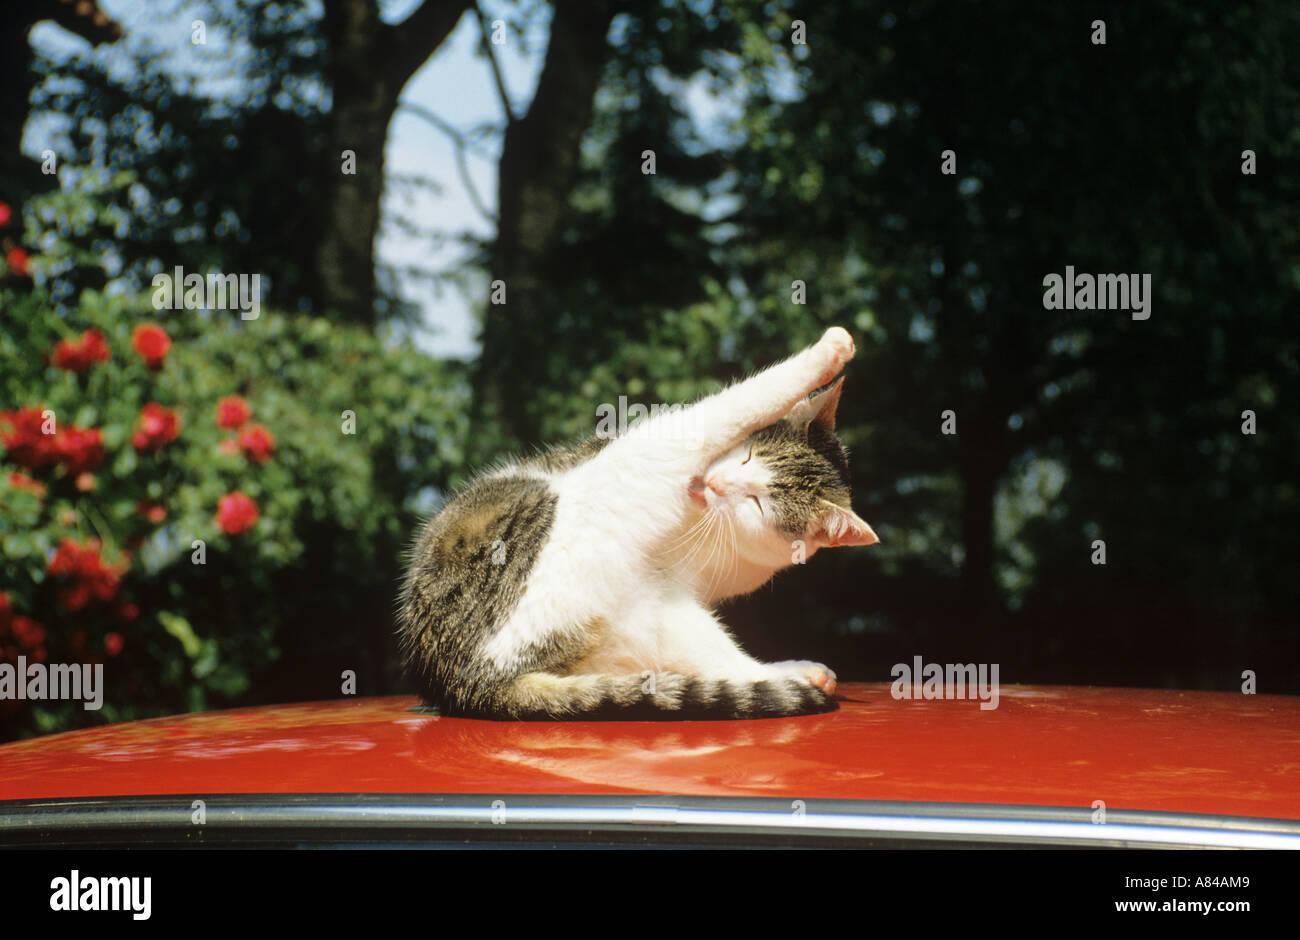 domestic cat on roof - preening itself - Stock Image